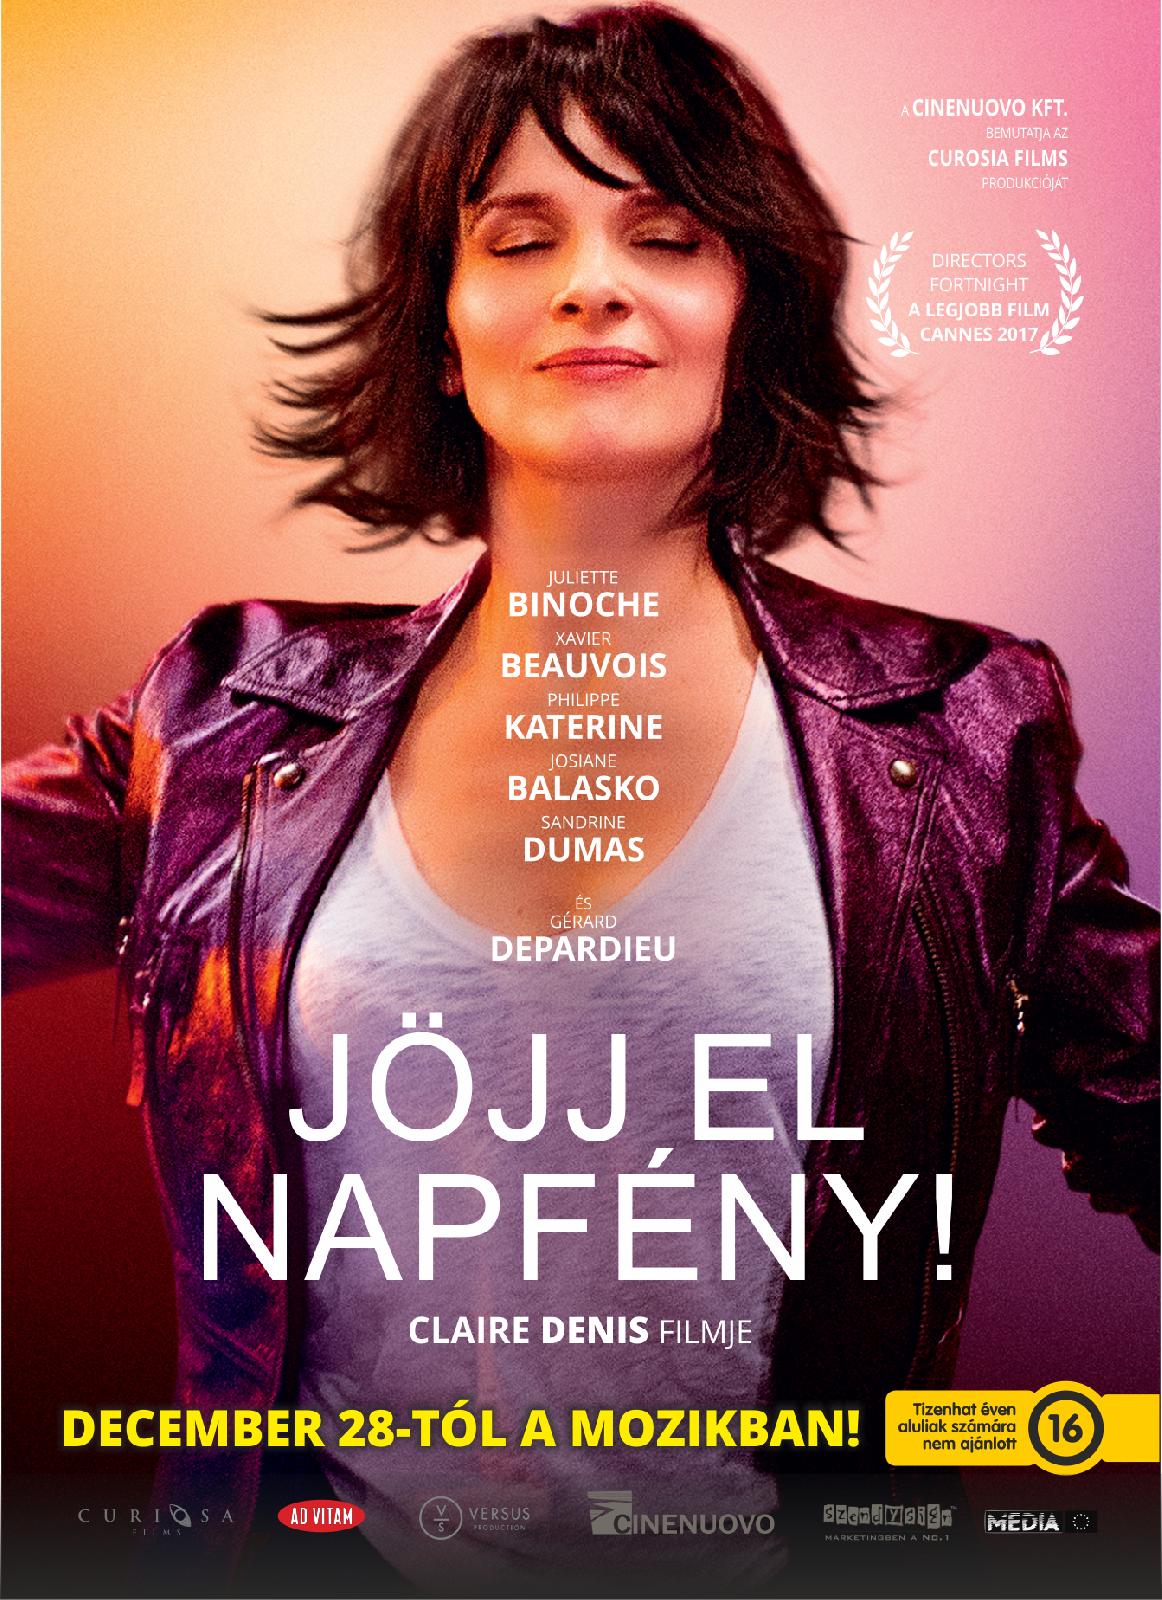 Jojj El Napfeny Un Beau Soleil Interieur 2017 Mafab Hu